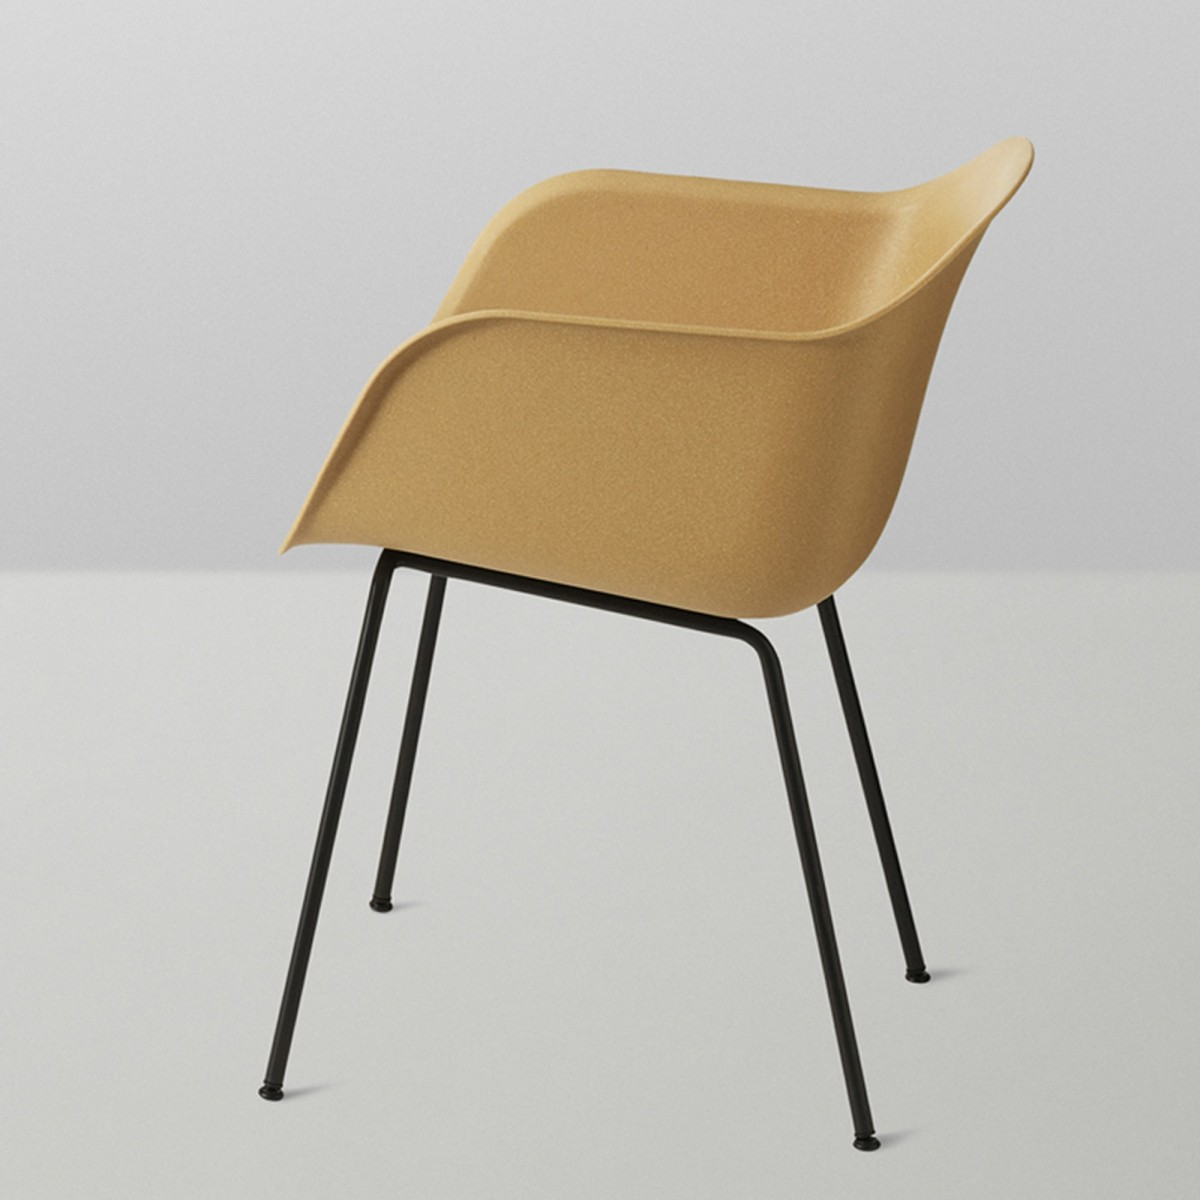 fiber furniture. FIBER Chair Tube Base - MUUTO. Loading Zoom Fiber Furniture